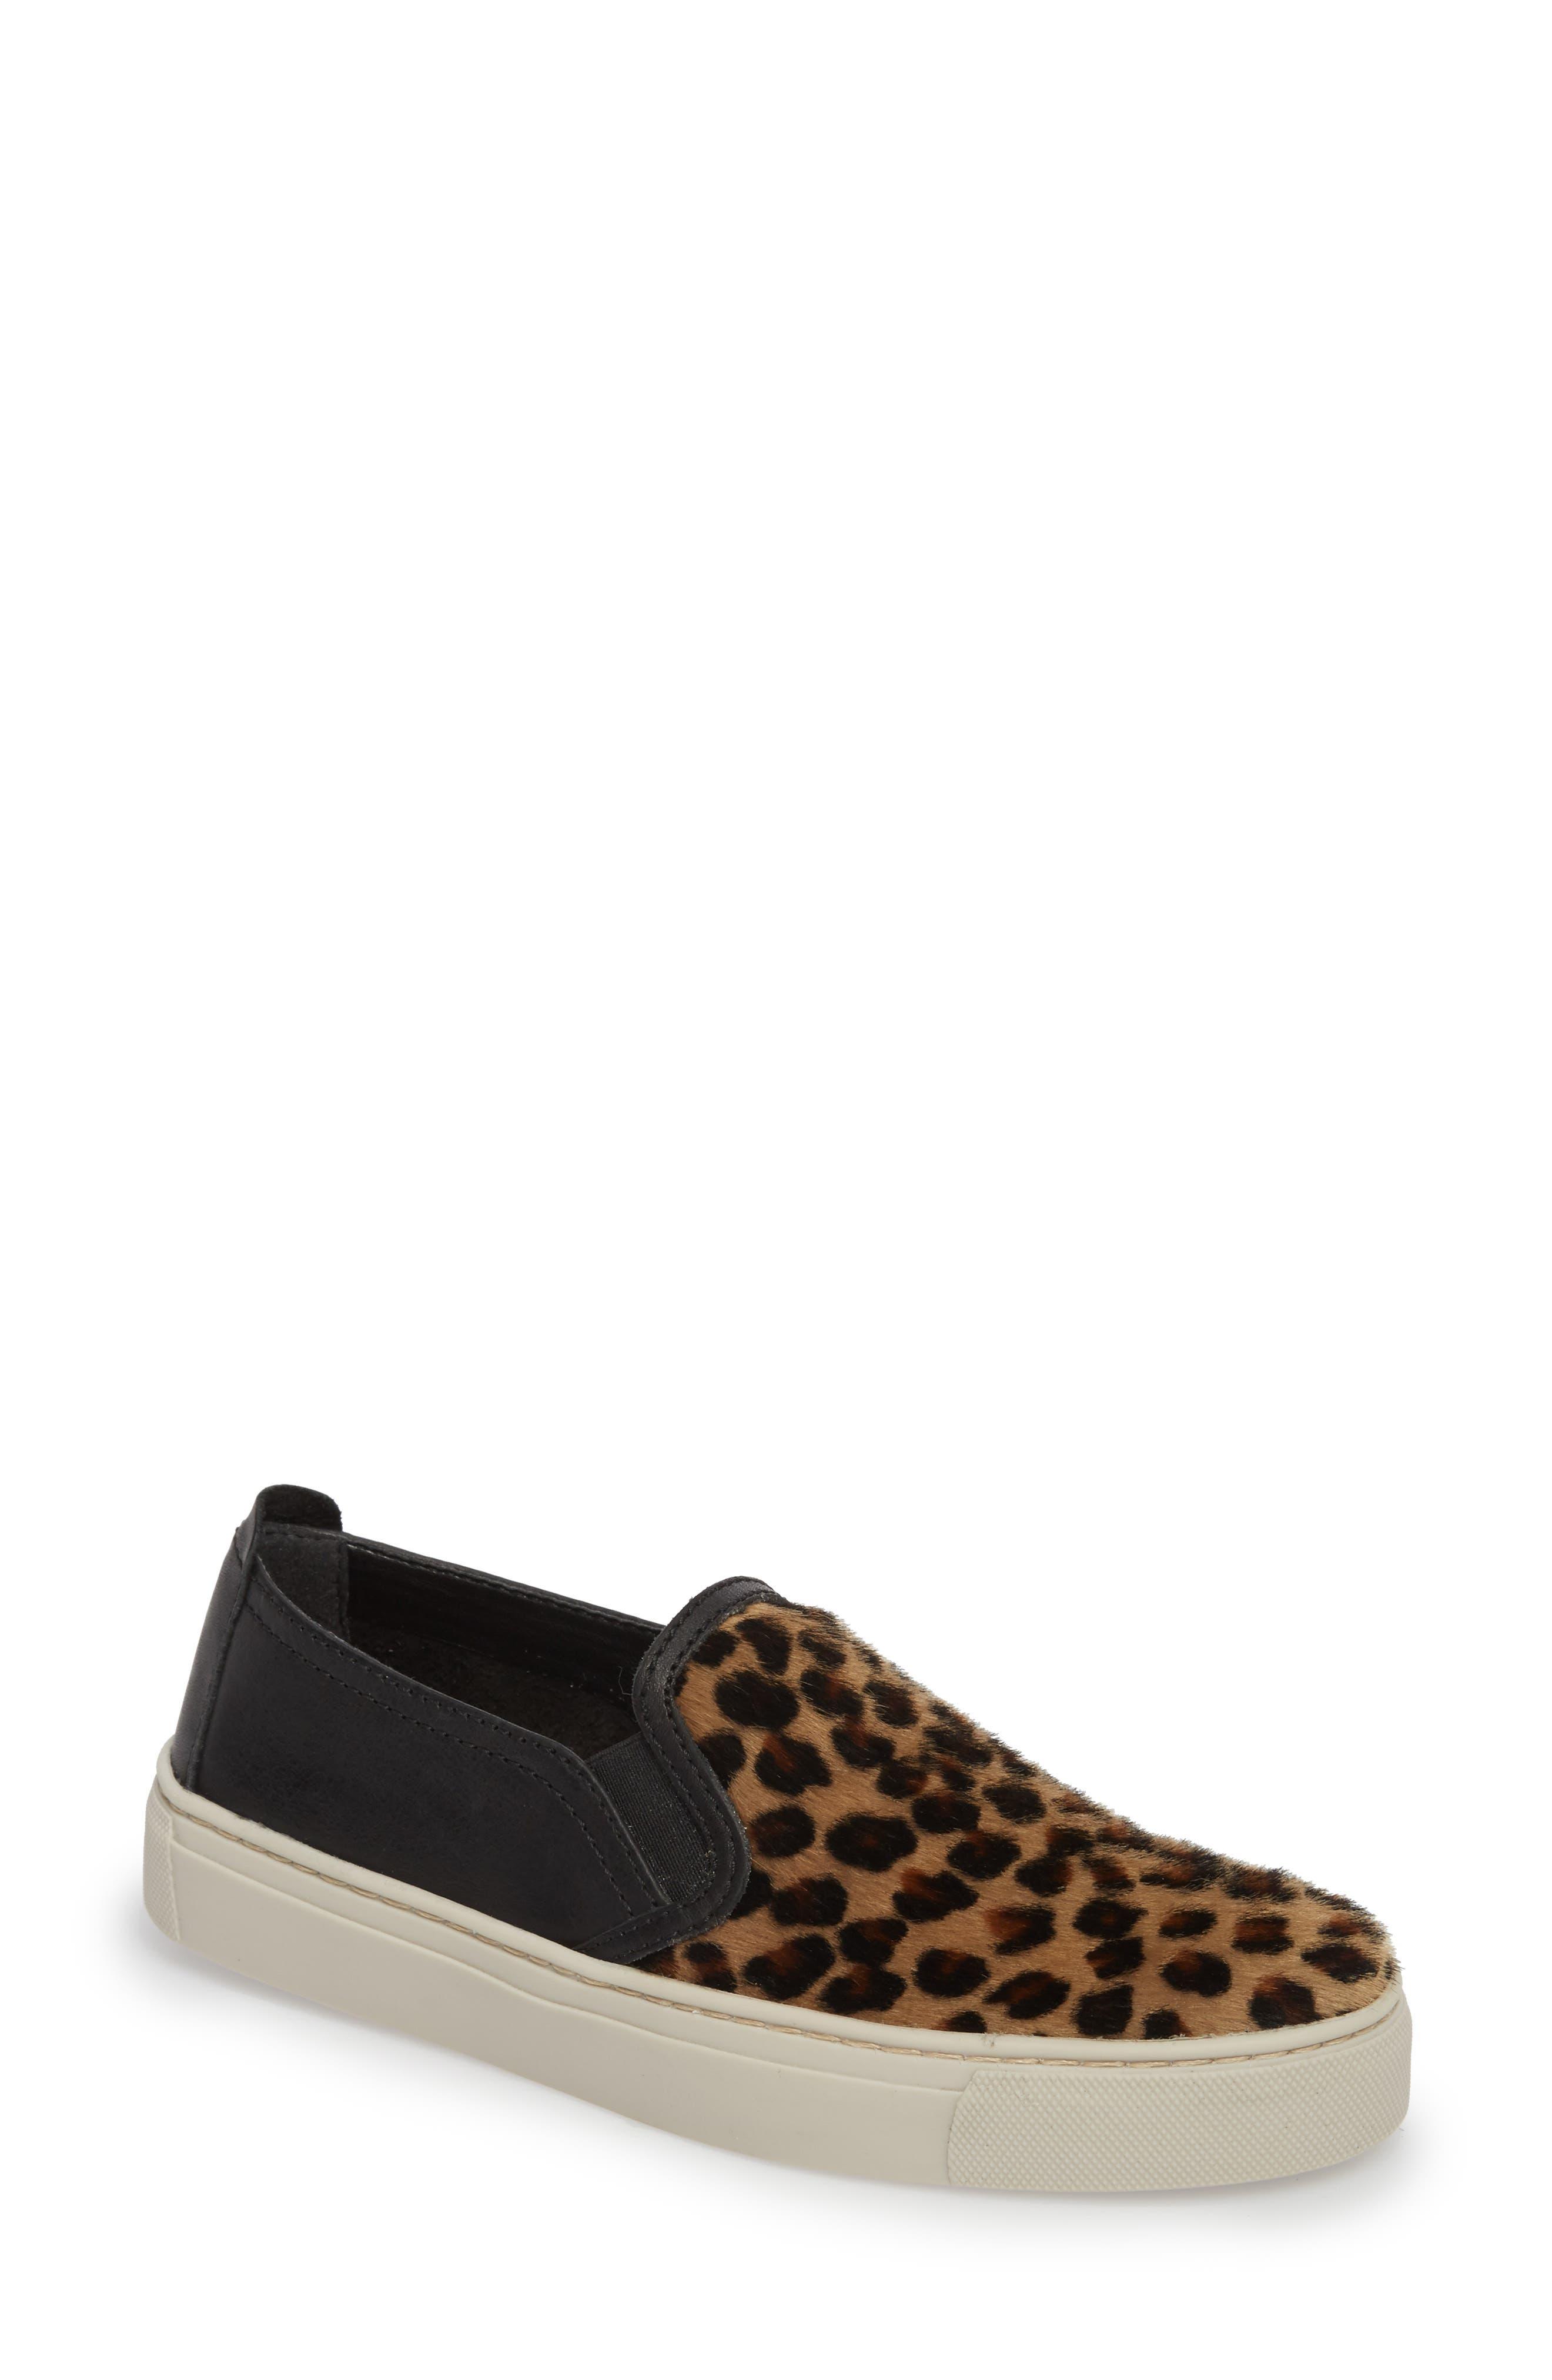 Sneak About Slip-On Sneaker,                             Main thumbnail 1, color,                             Jaguar Black Leather